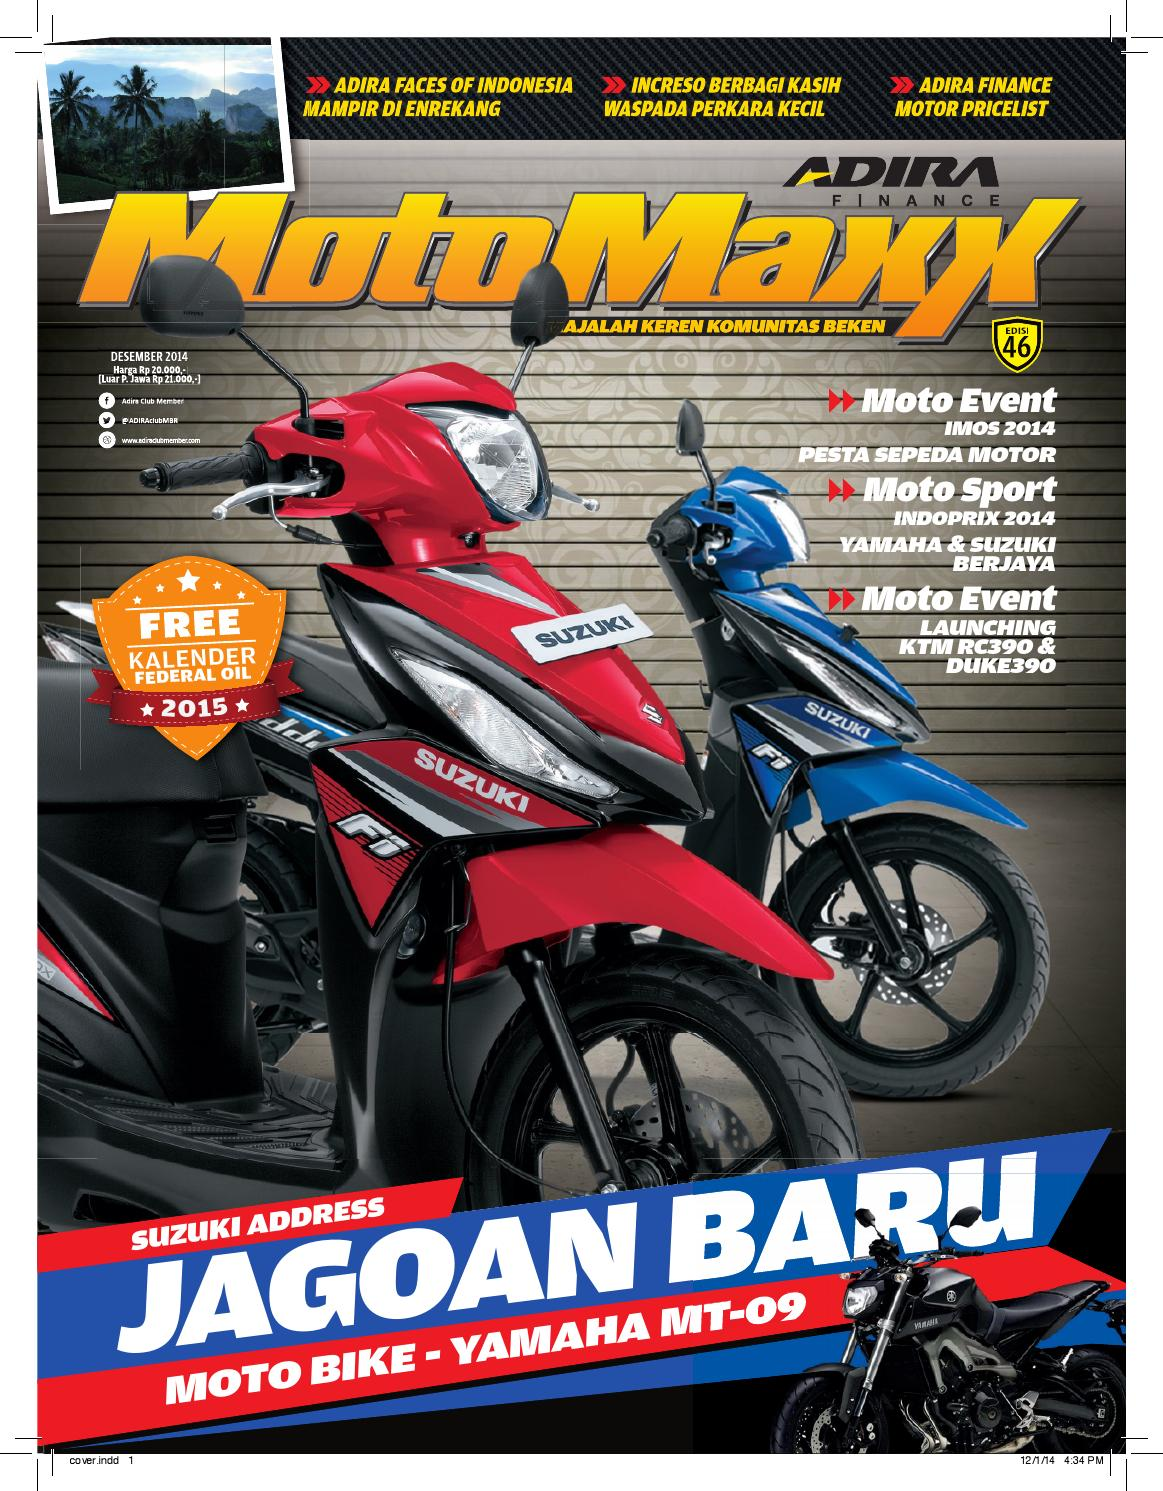 Motomaxx 12 2014 By Adira Member Issuu All New Beat Sporty Esp Cbs Iss Soul Red White Kota Semarang